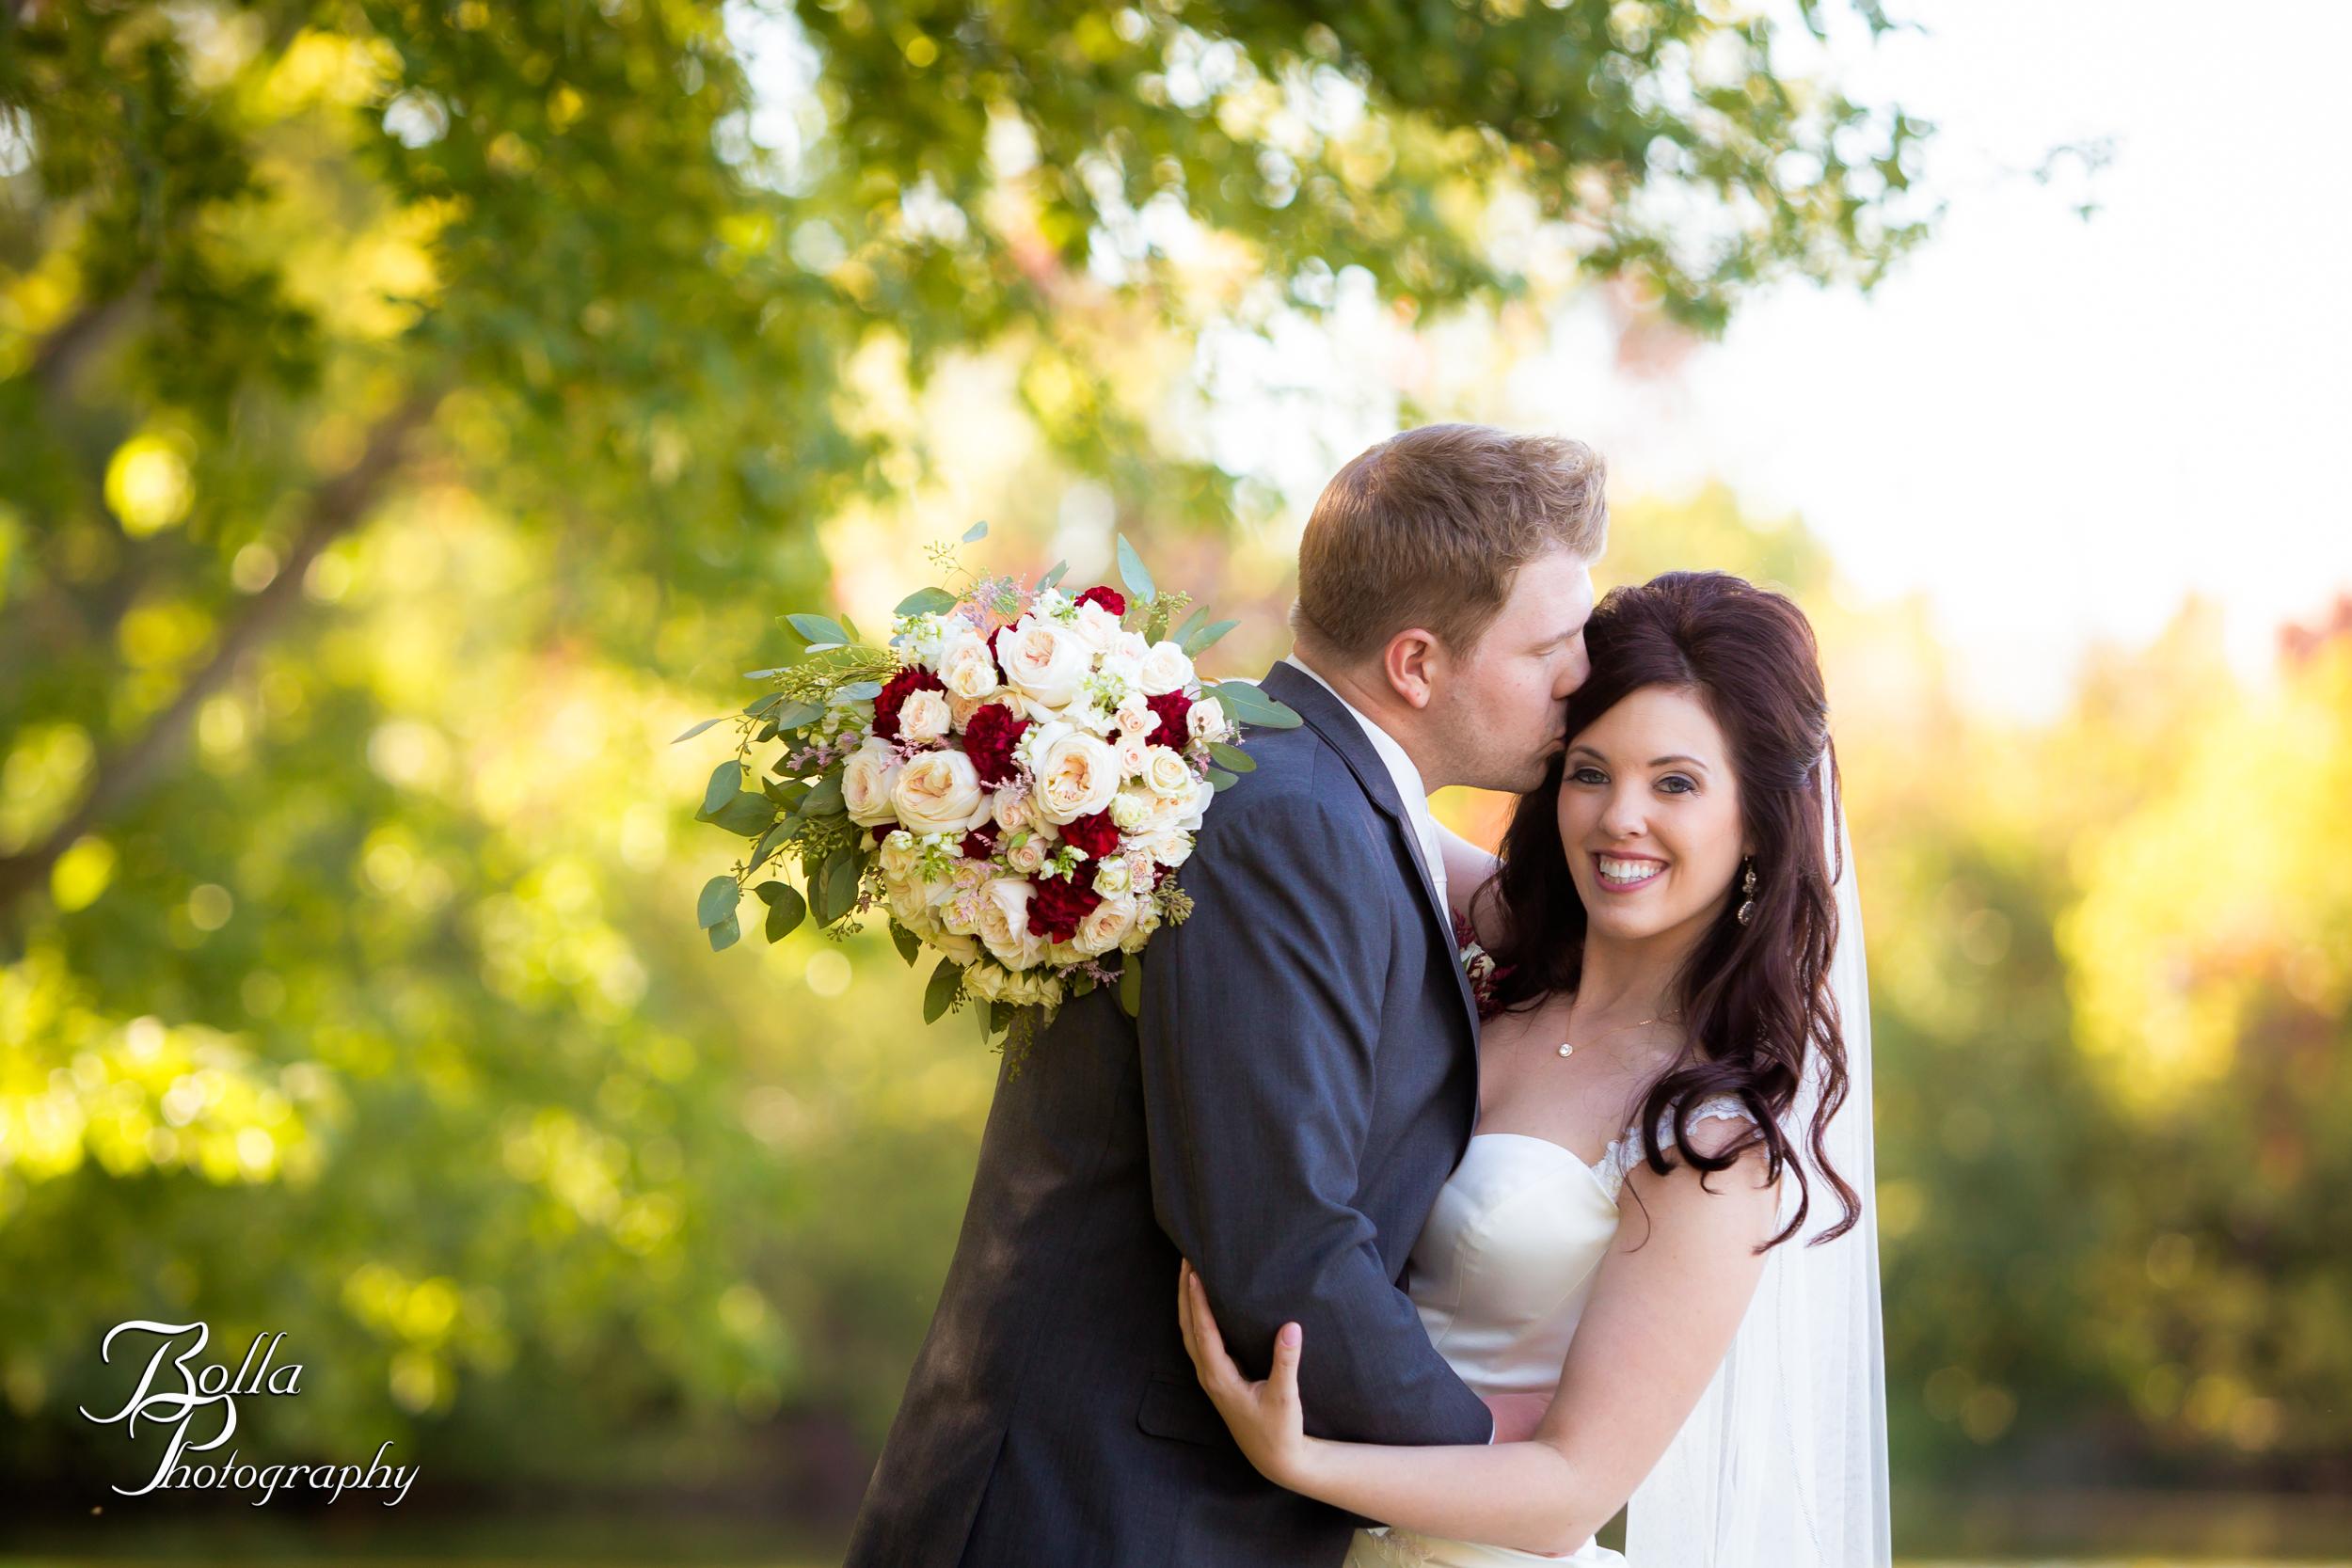 Bolla_photography_edwardsville_wedding_photographer_st_louis_weddings_Reilmann-0004.jpg